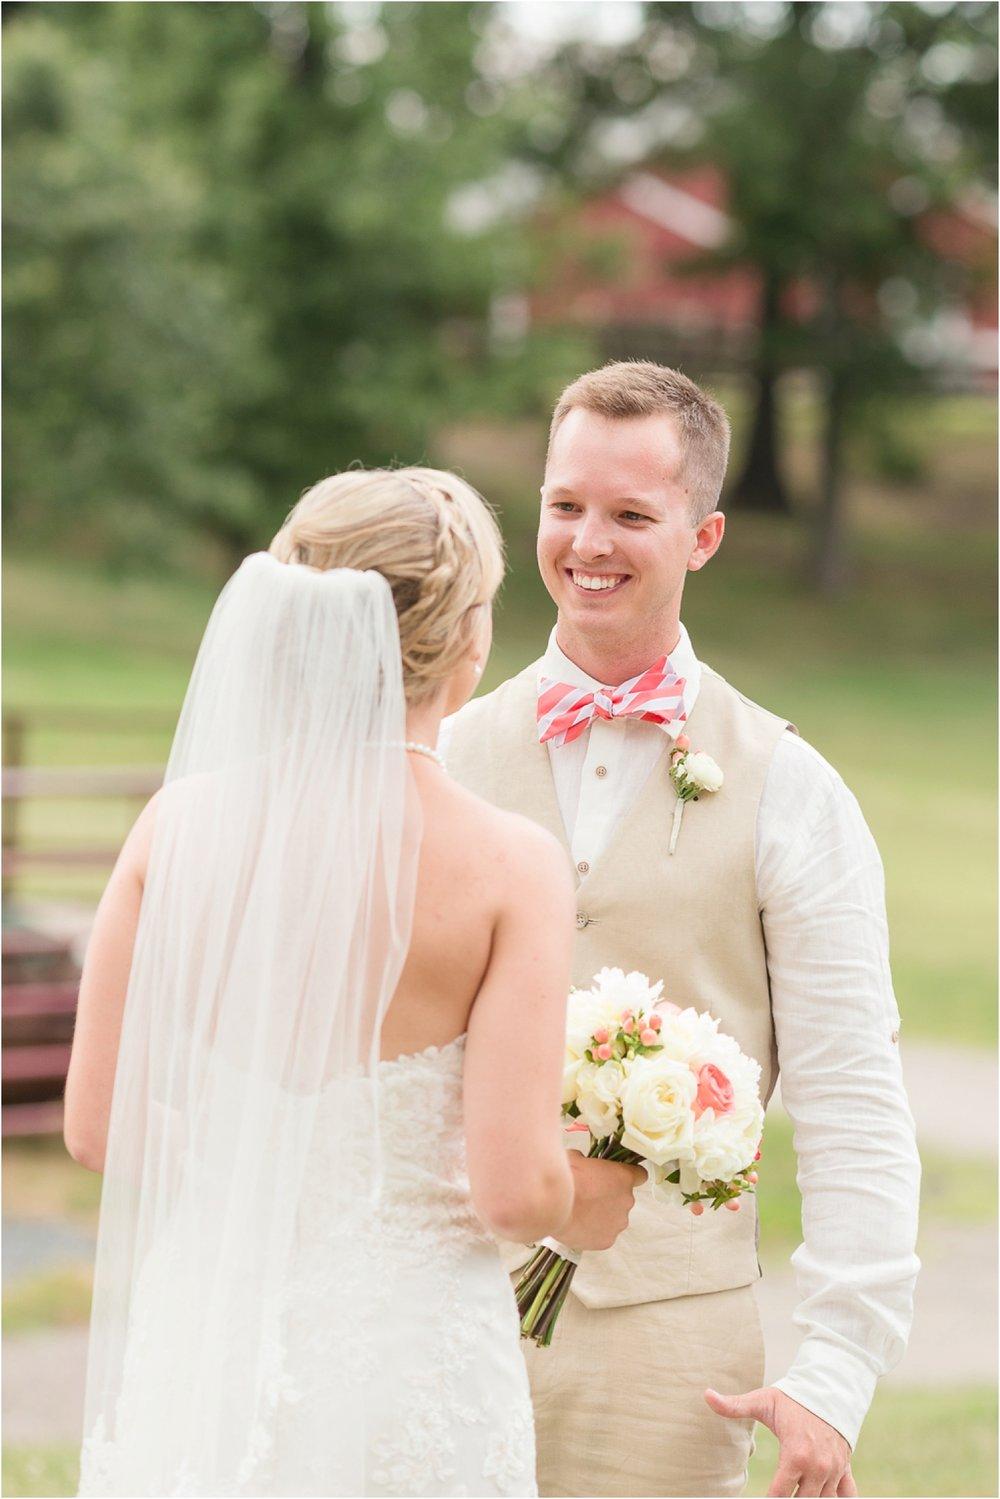 Celebrations-at-the-bay-wedding-photos-38.jpg